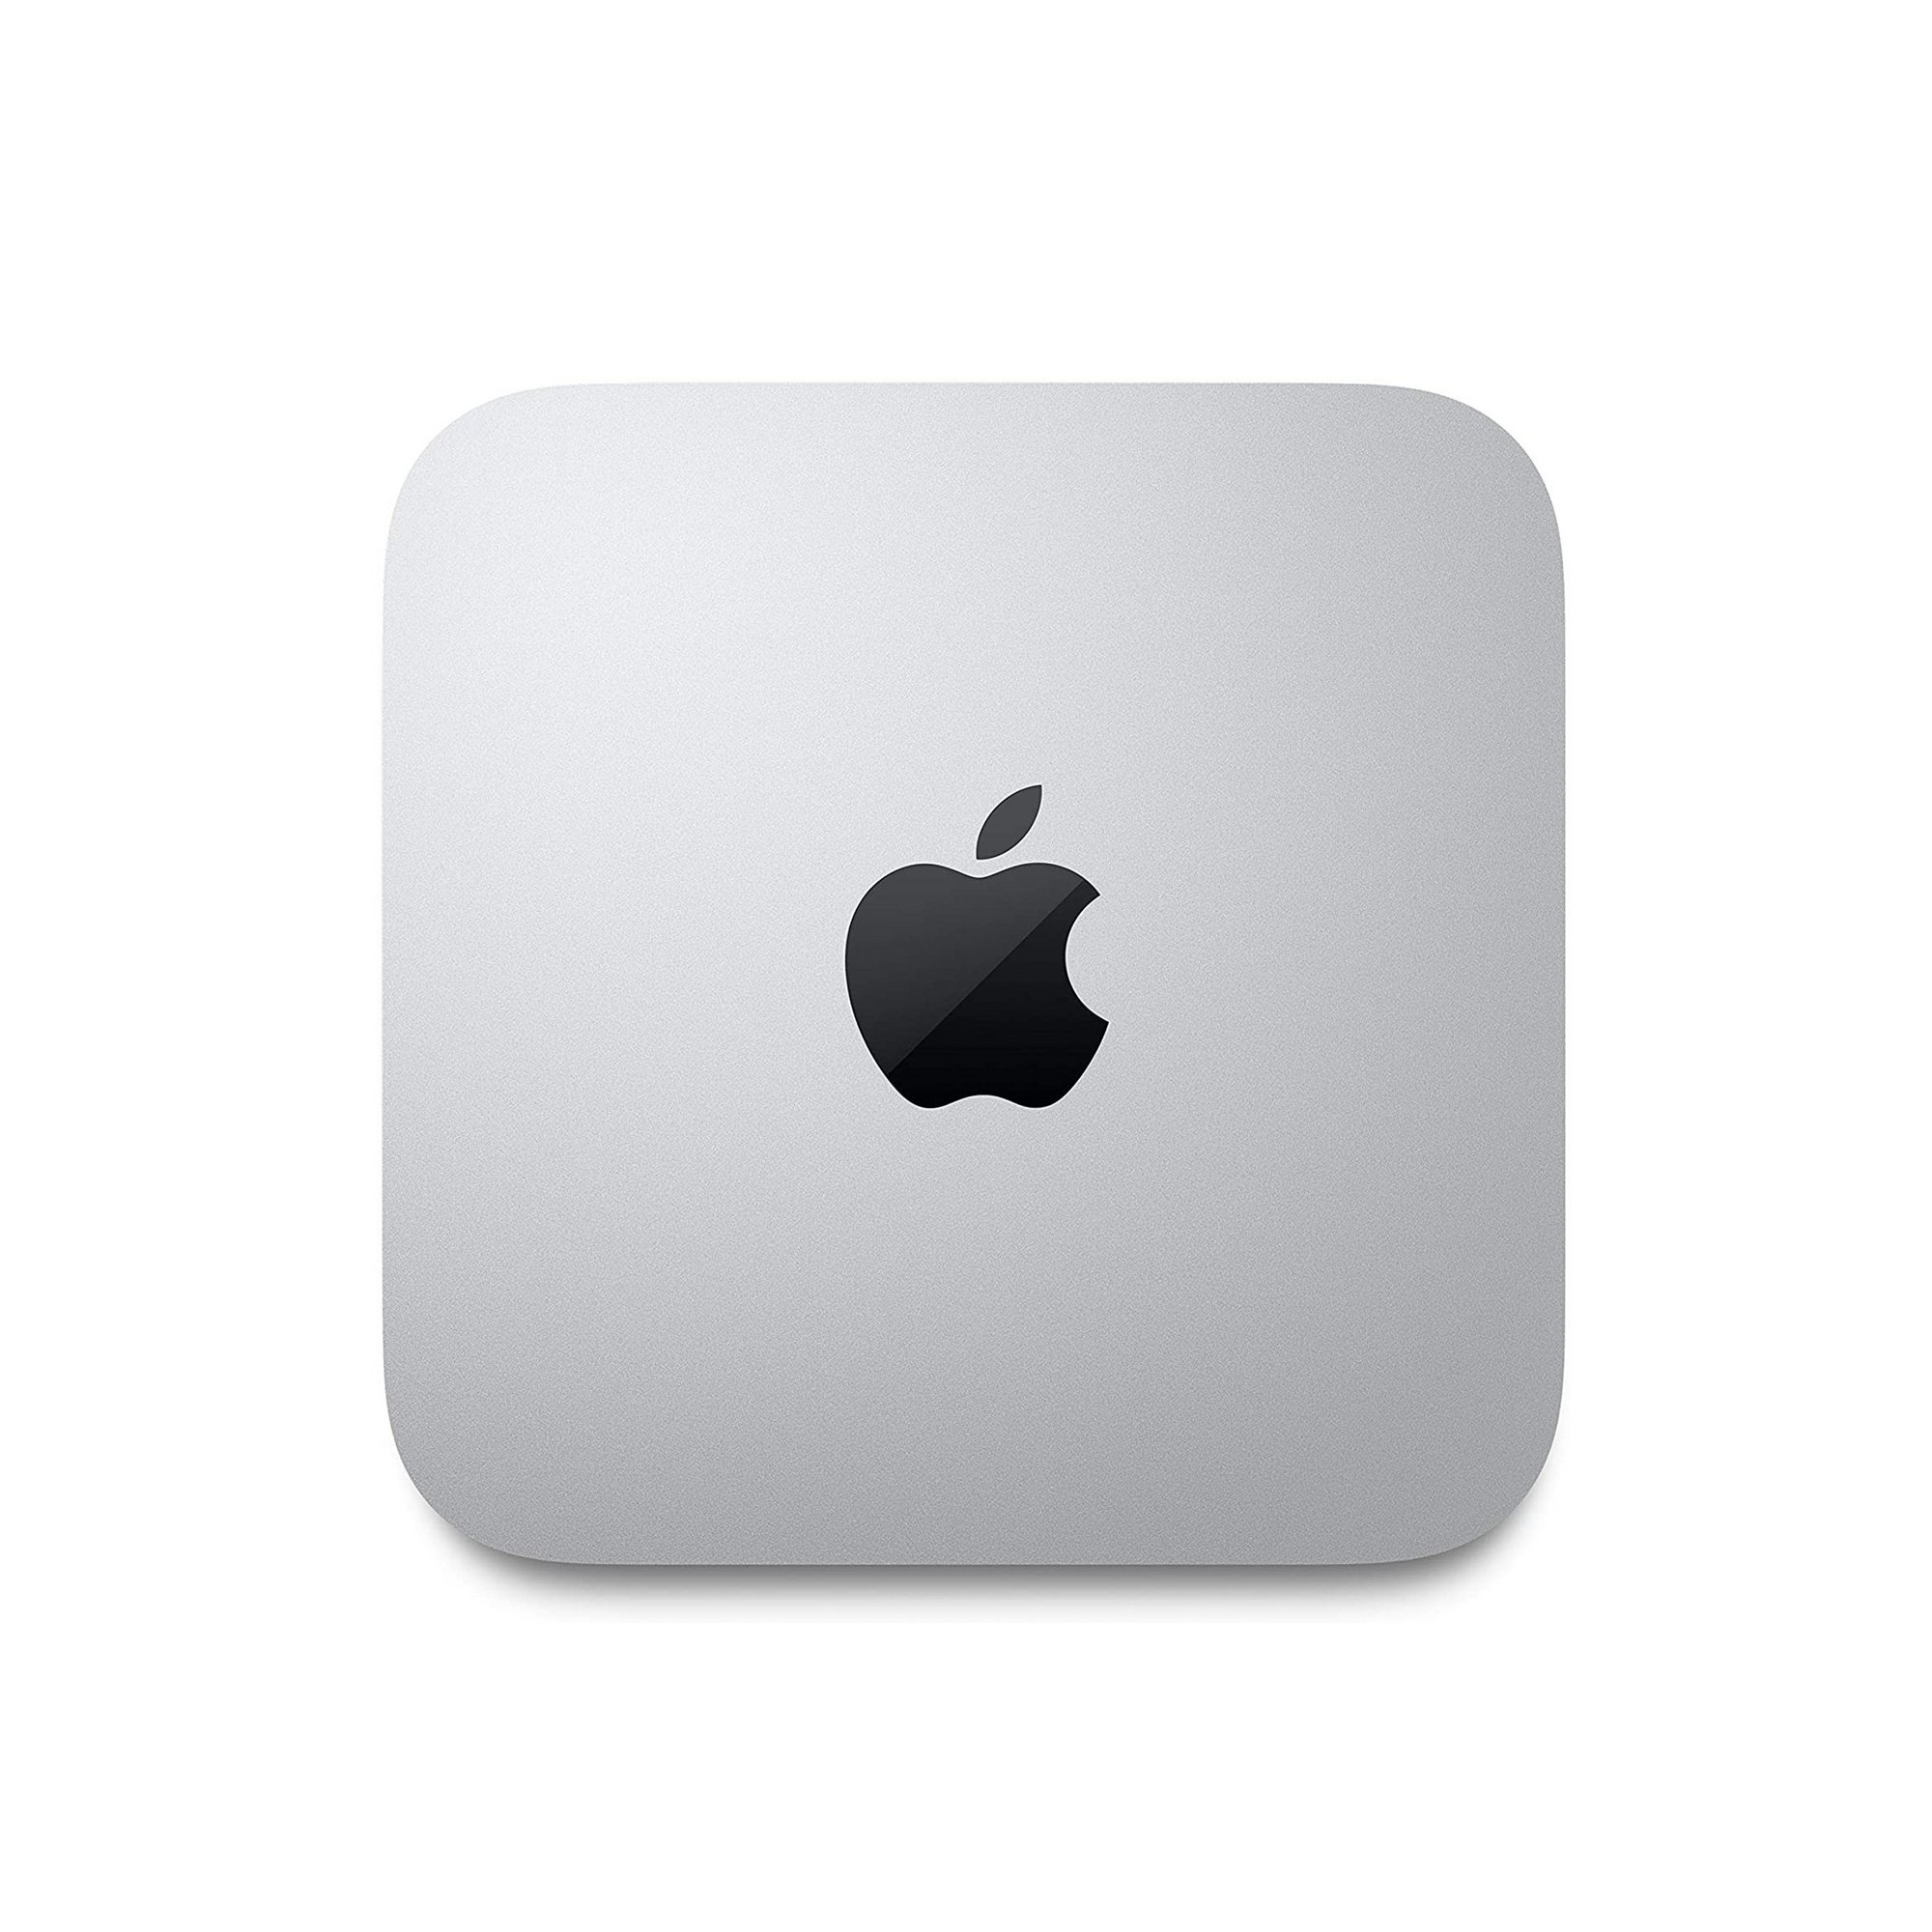 Image of Apple Mac Mini 2020 M1 Chip 512GB Silver